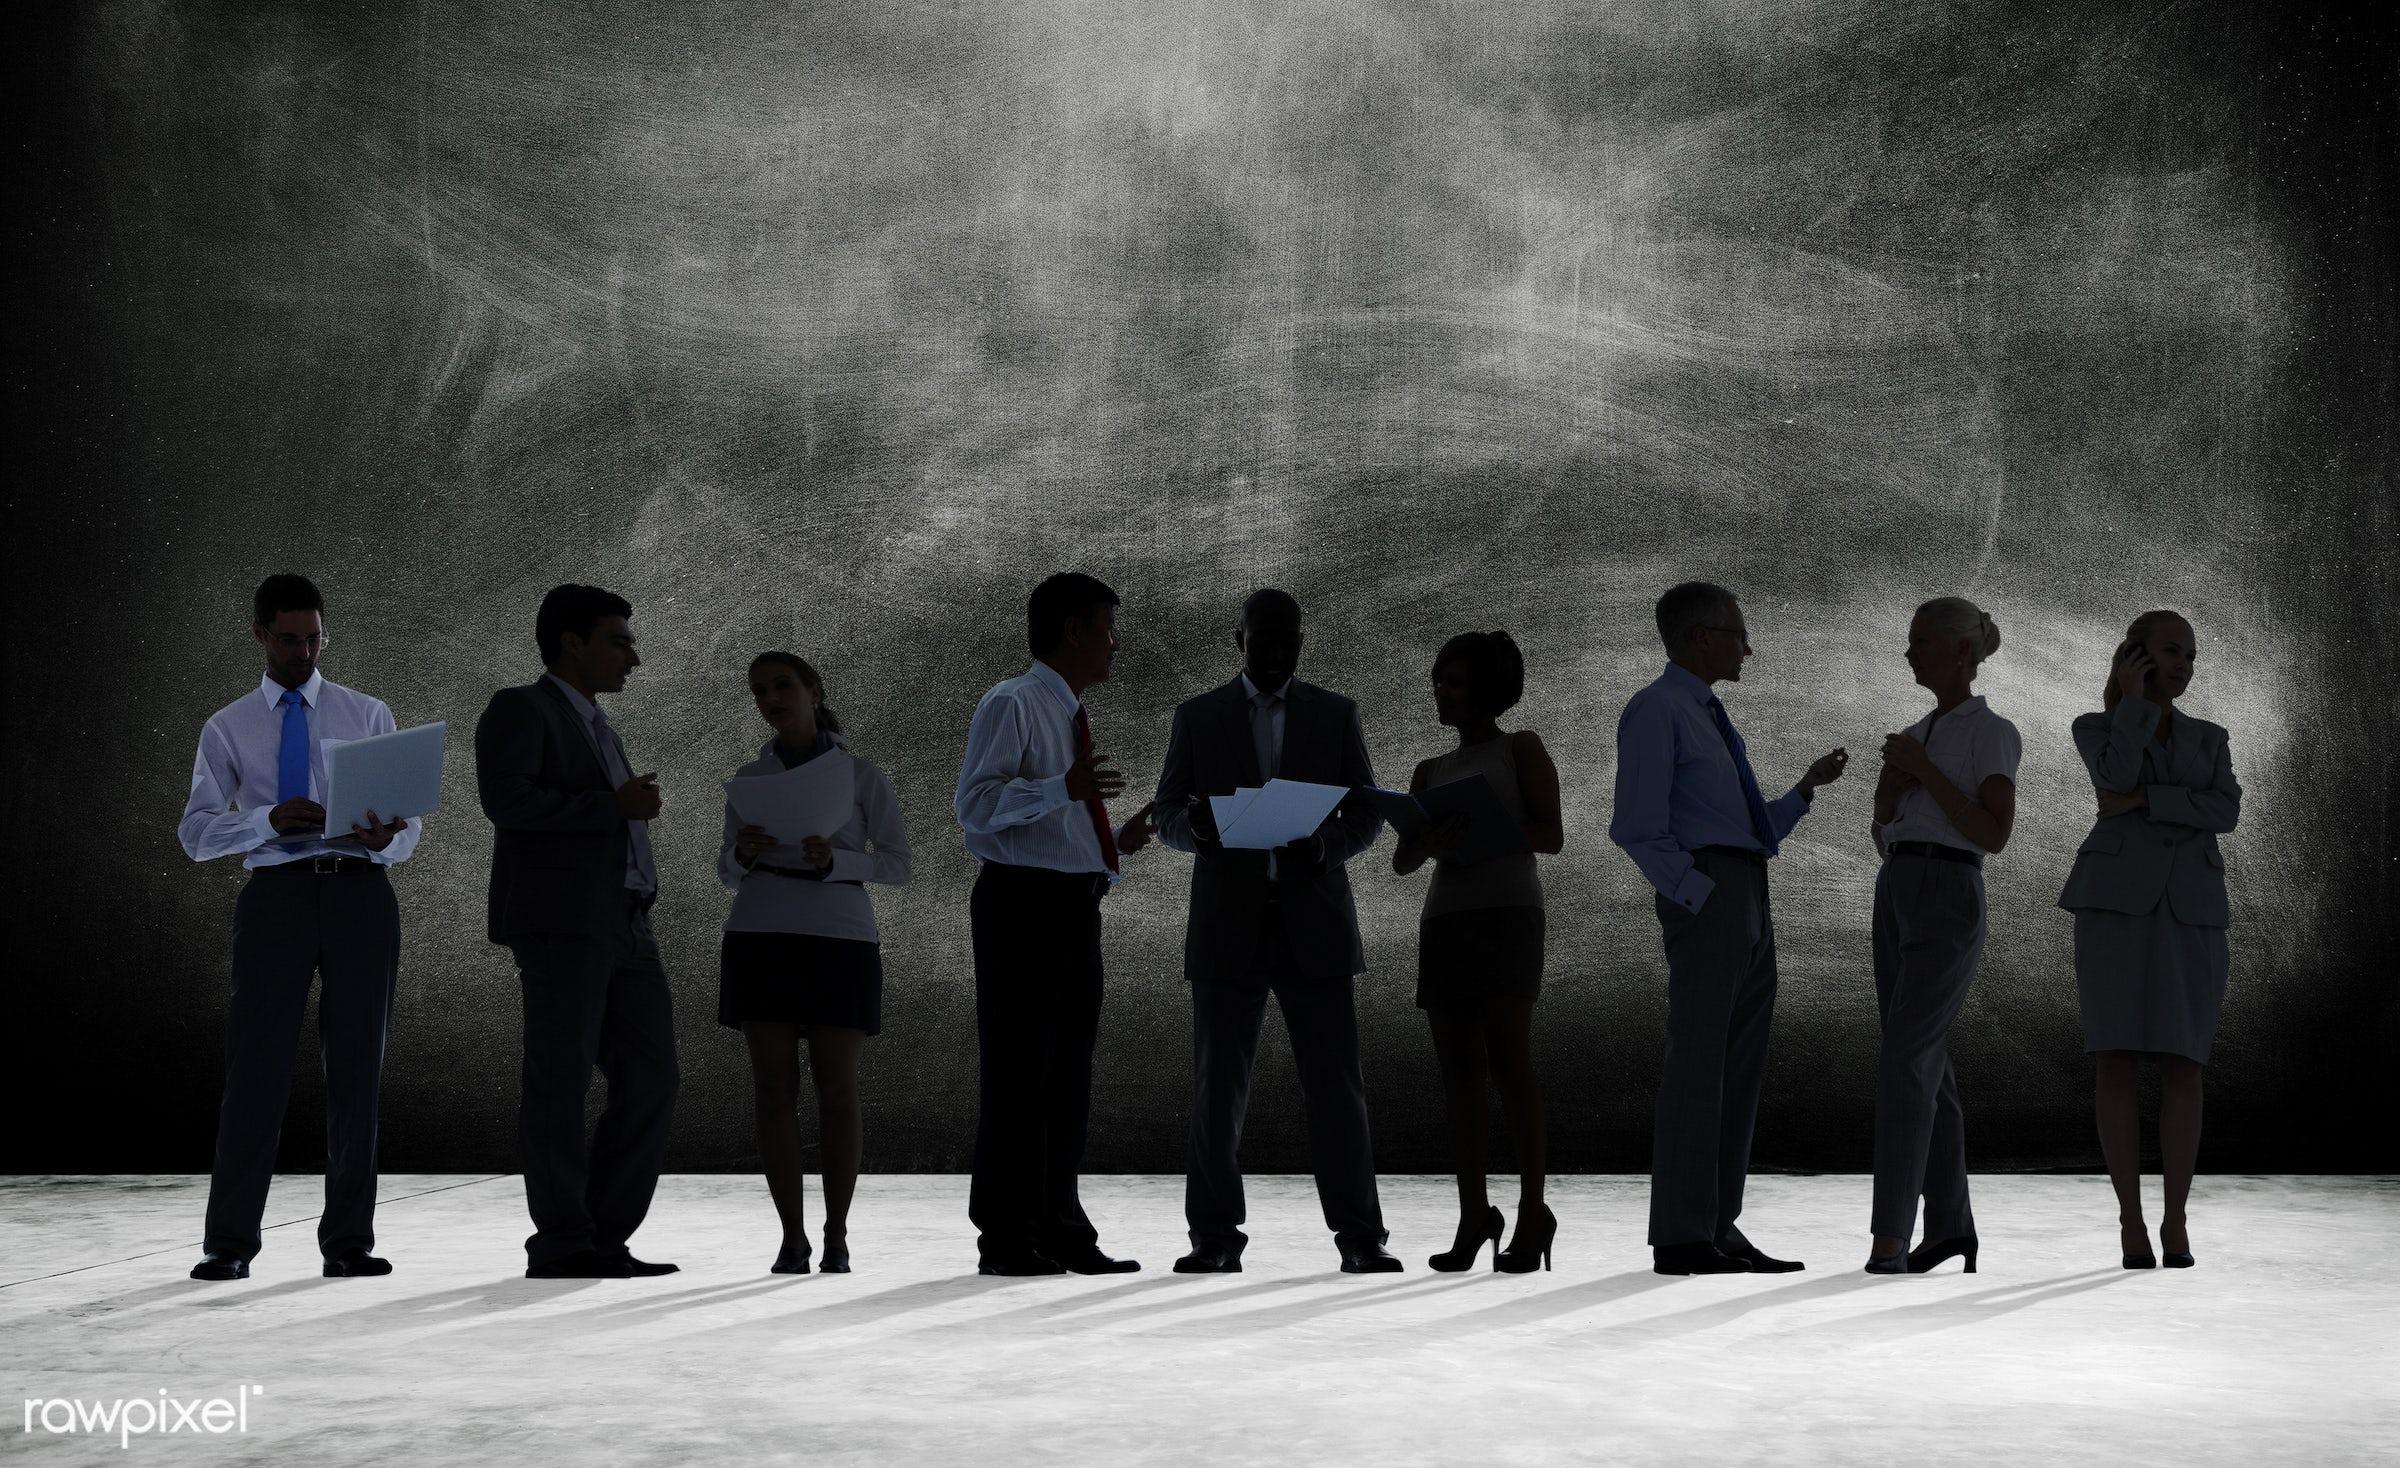 blackboard, blank, business, business people, businessmen, businesswomen, colleagues, communication, connection,...